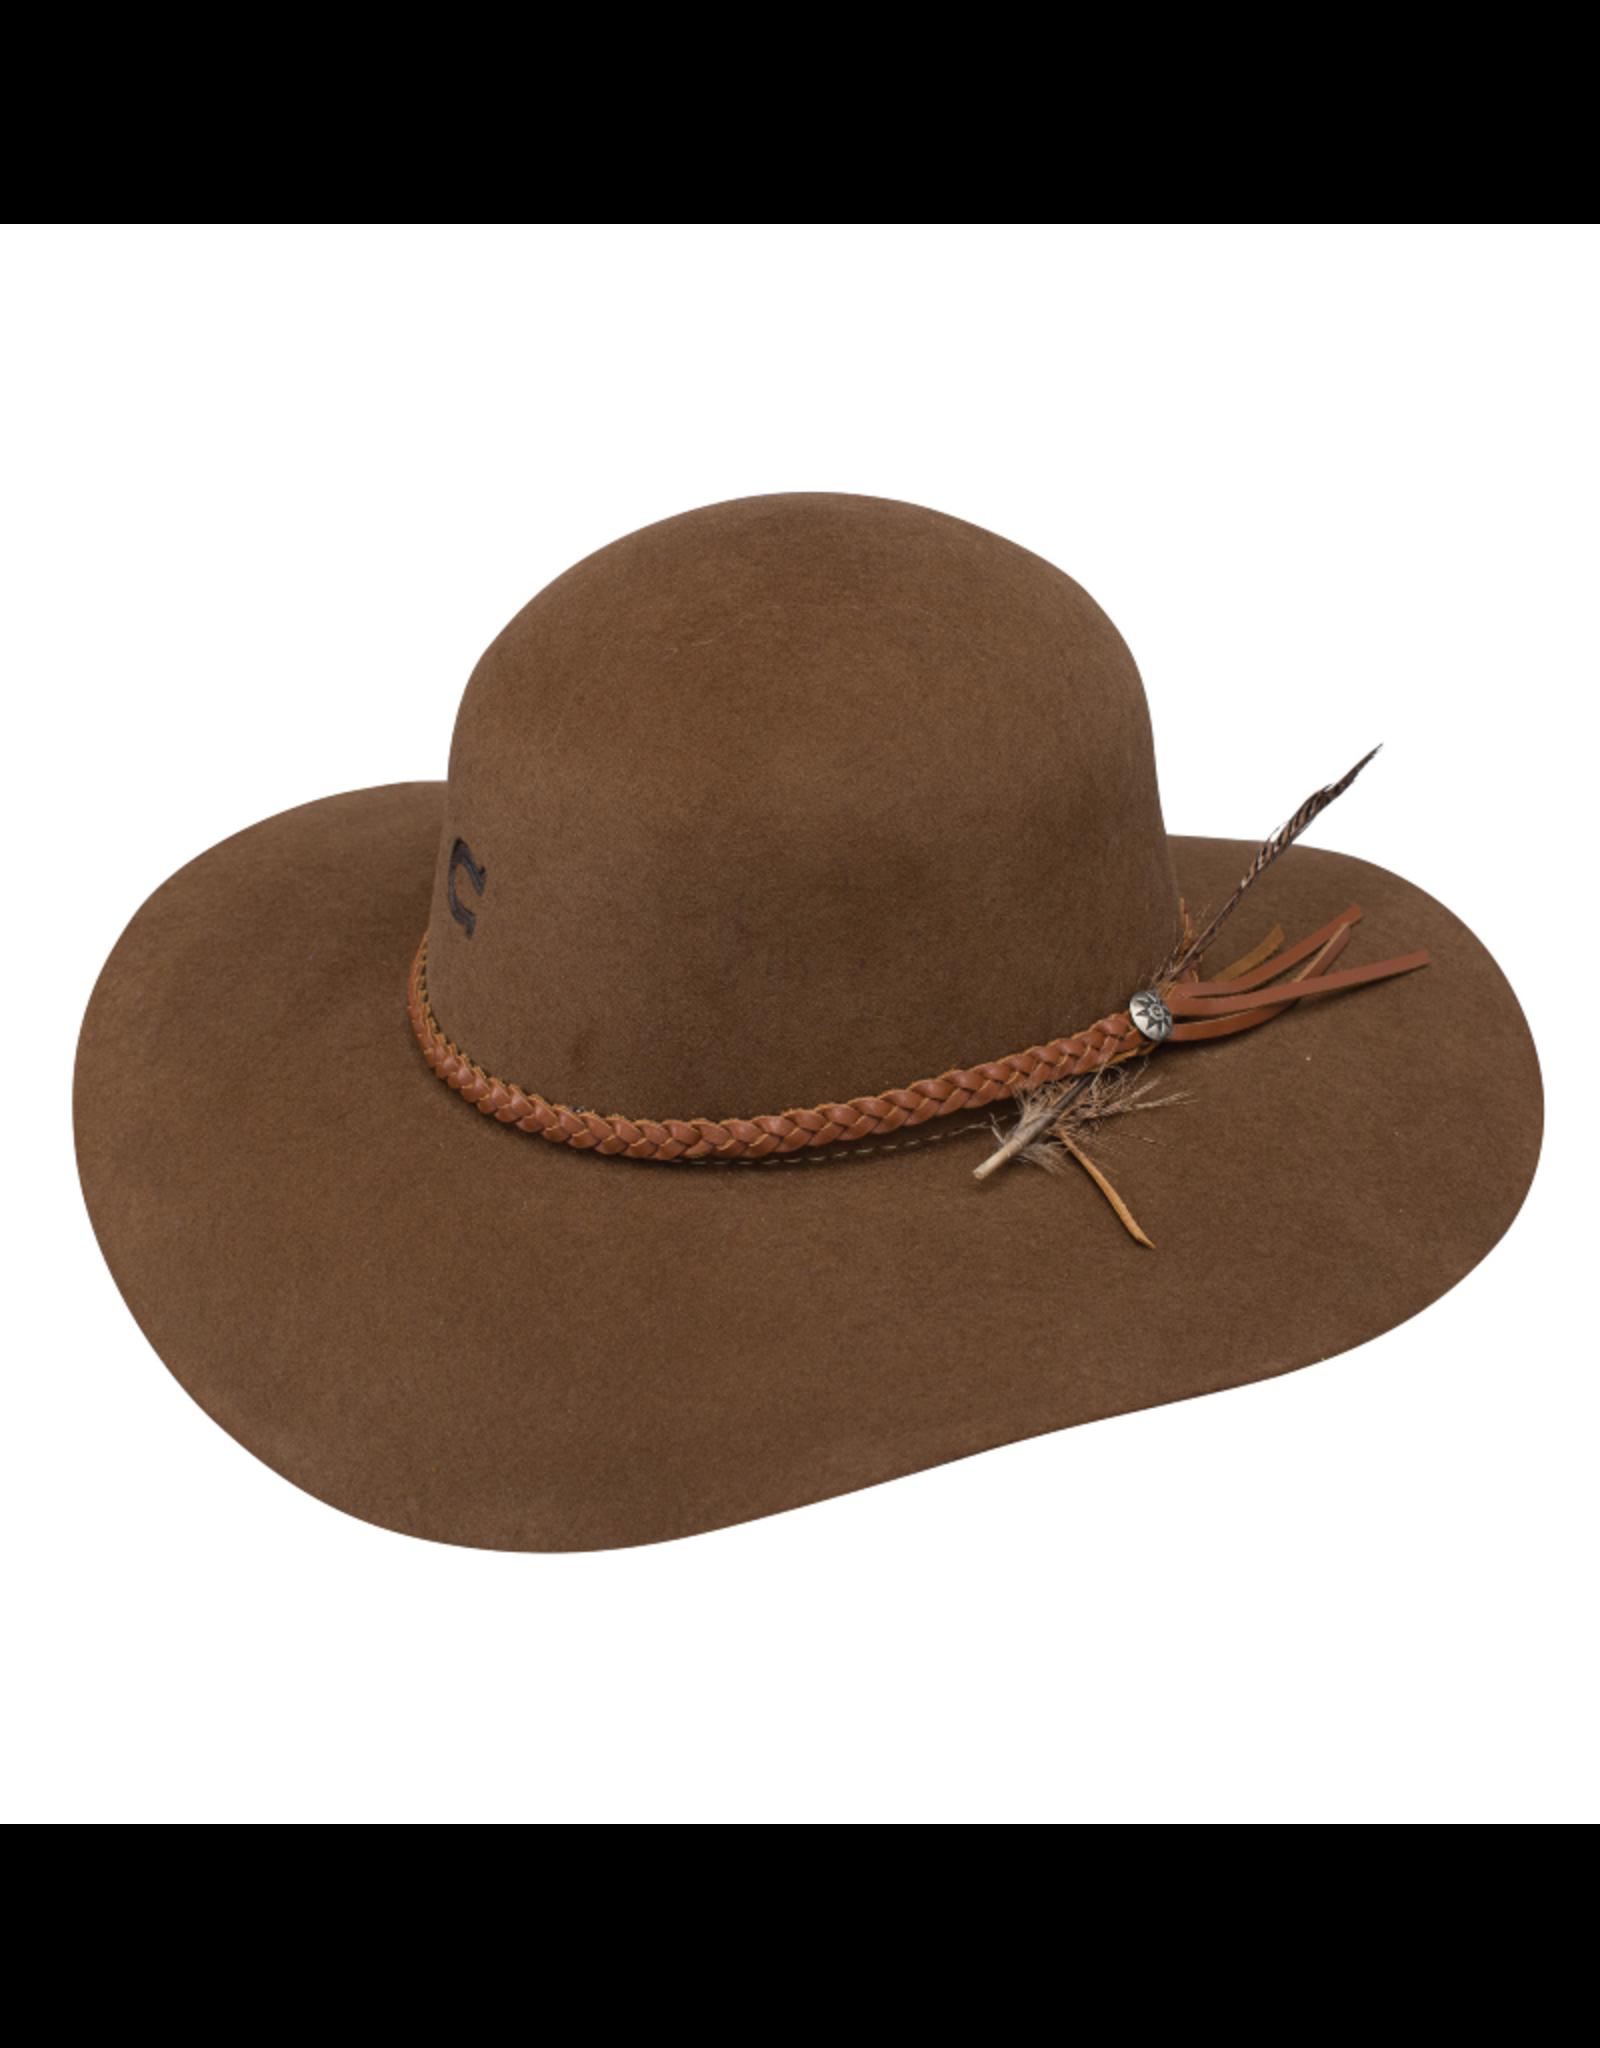 Stetson Hats Stetson Charlie 1 Horse Wanderlust Hat